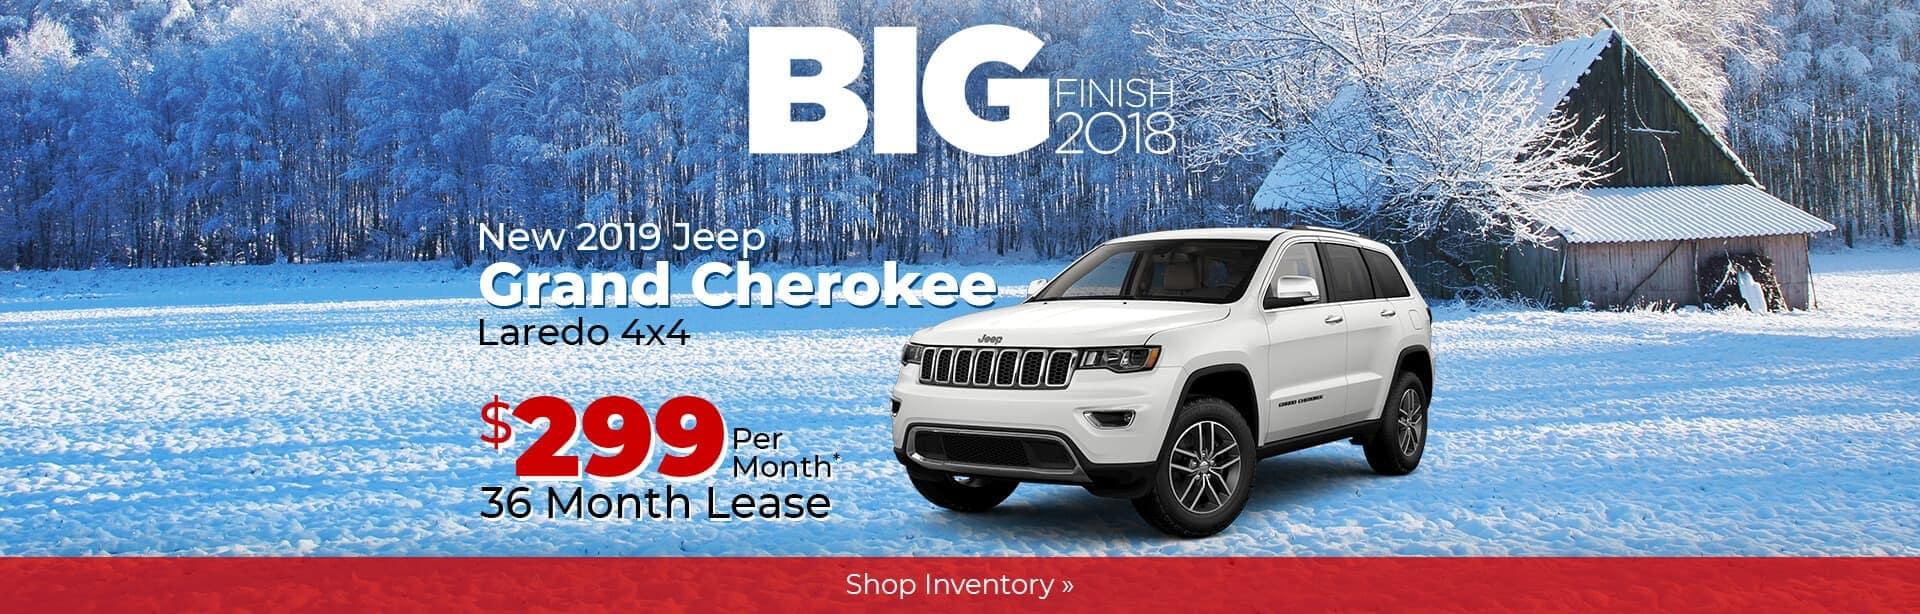 2019 Jeep Grand Cherokee Big Finish Savings Event in Crawfordsville, Indiana.